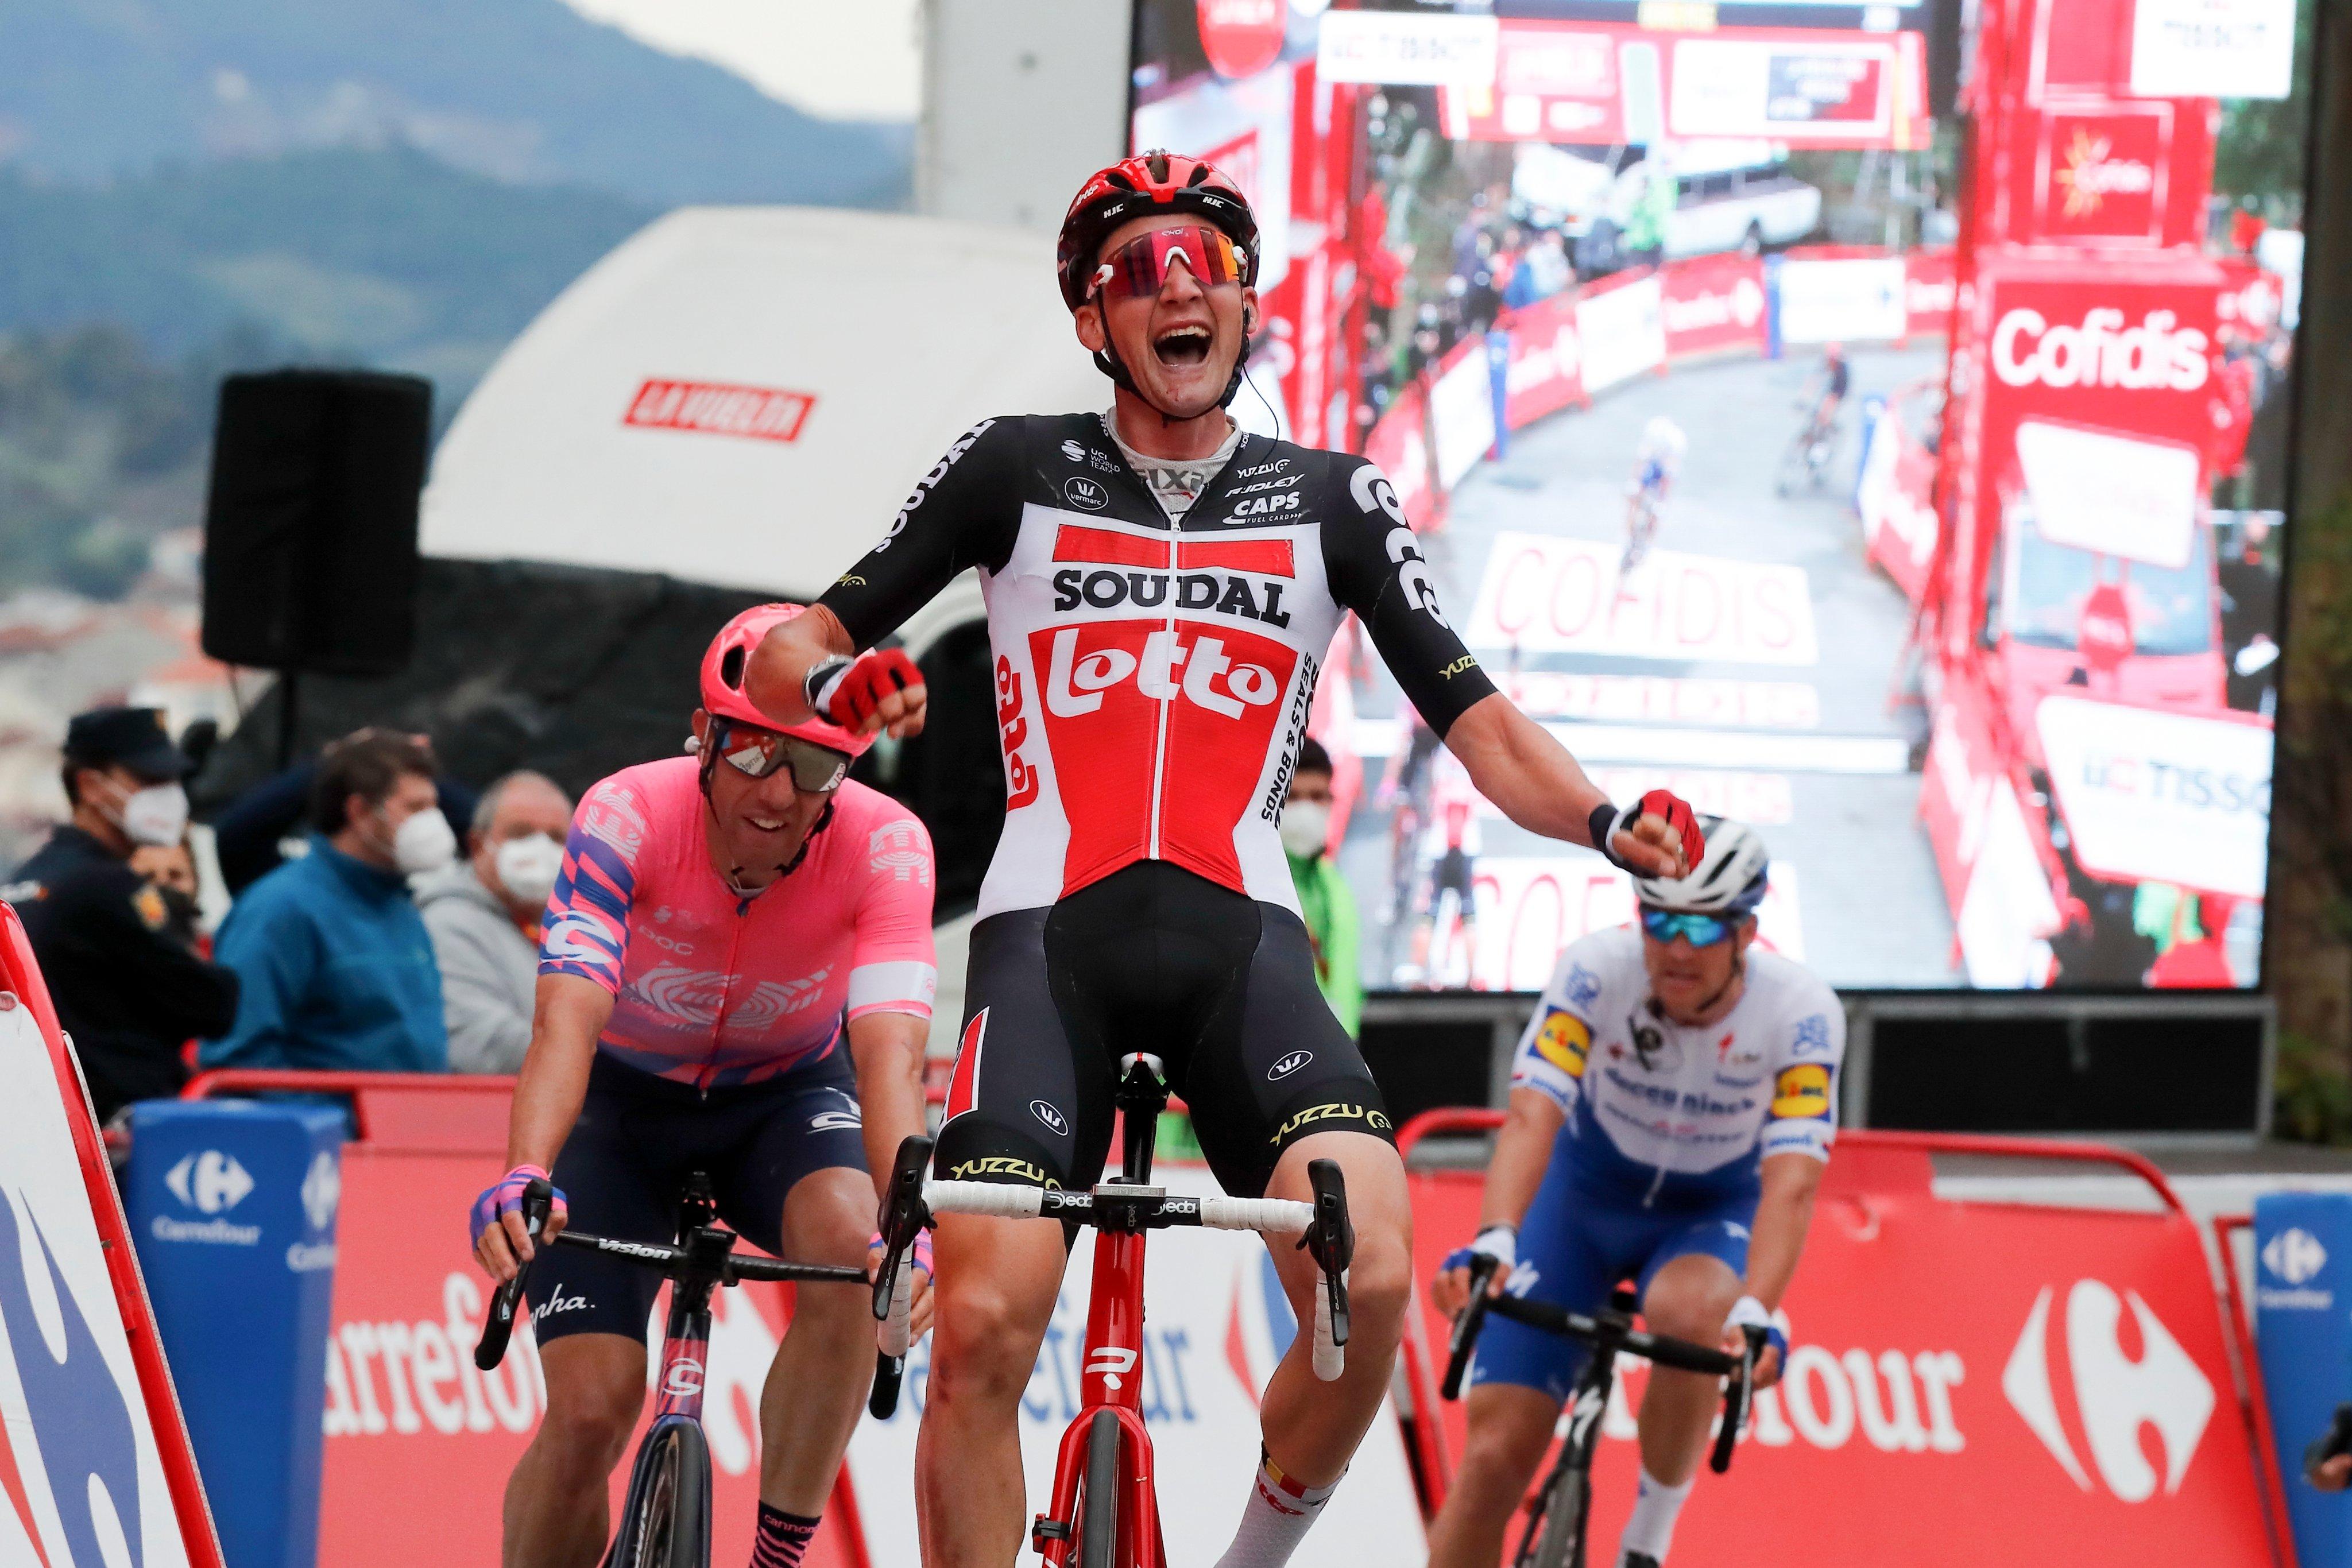 Tim Wellens ganó la decimocuarta etapa de la Vuelta a España 2020 (Photo Gómez Sport)